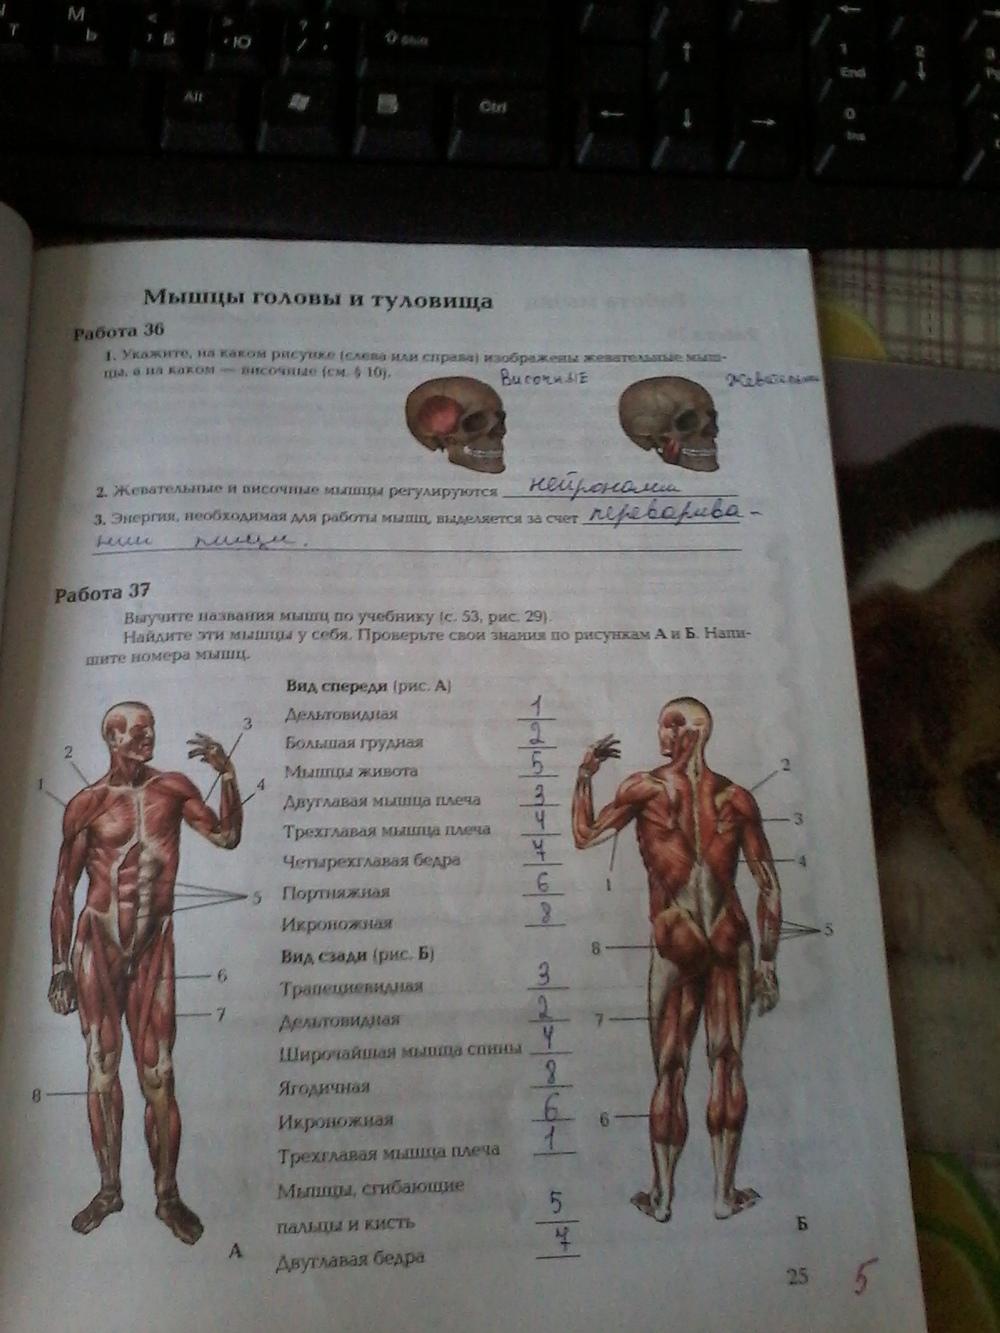 Онлайн гдз по биологии класс автора.г.драгомилов р.д.маш